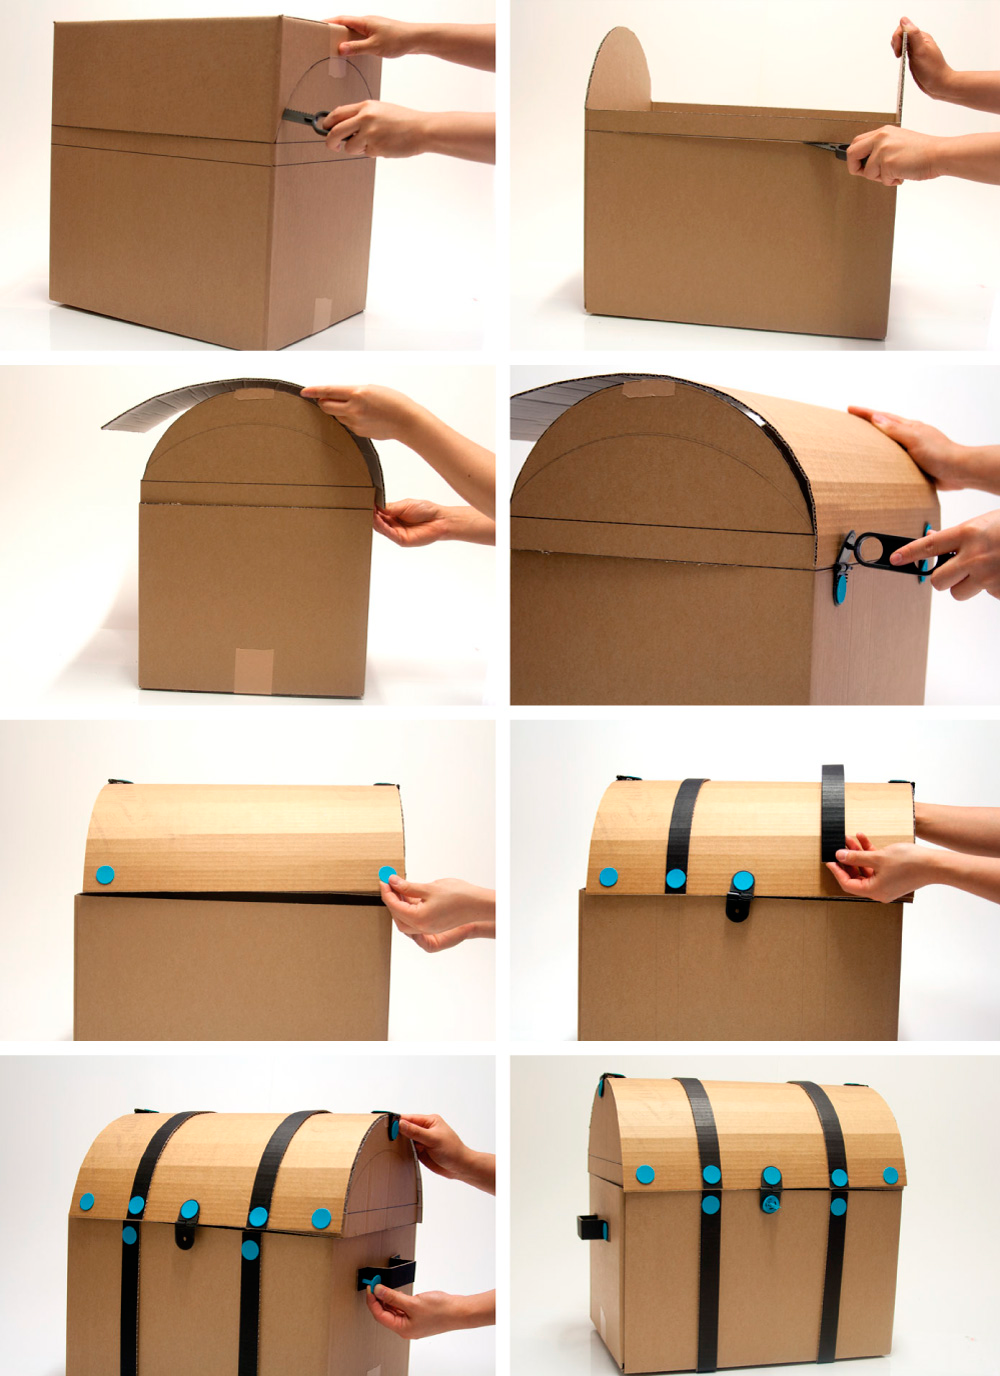 diy cardboard furniture. How To Make Cardboard Furniture. A DIY Treasure Chest. Furniture Diy N